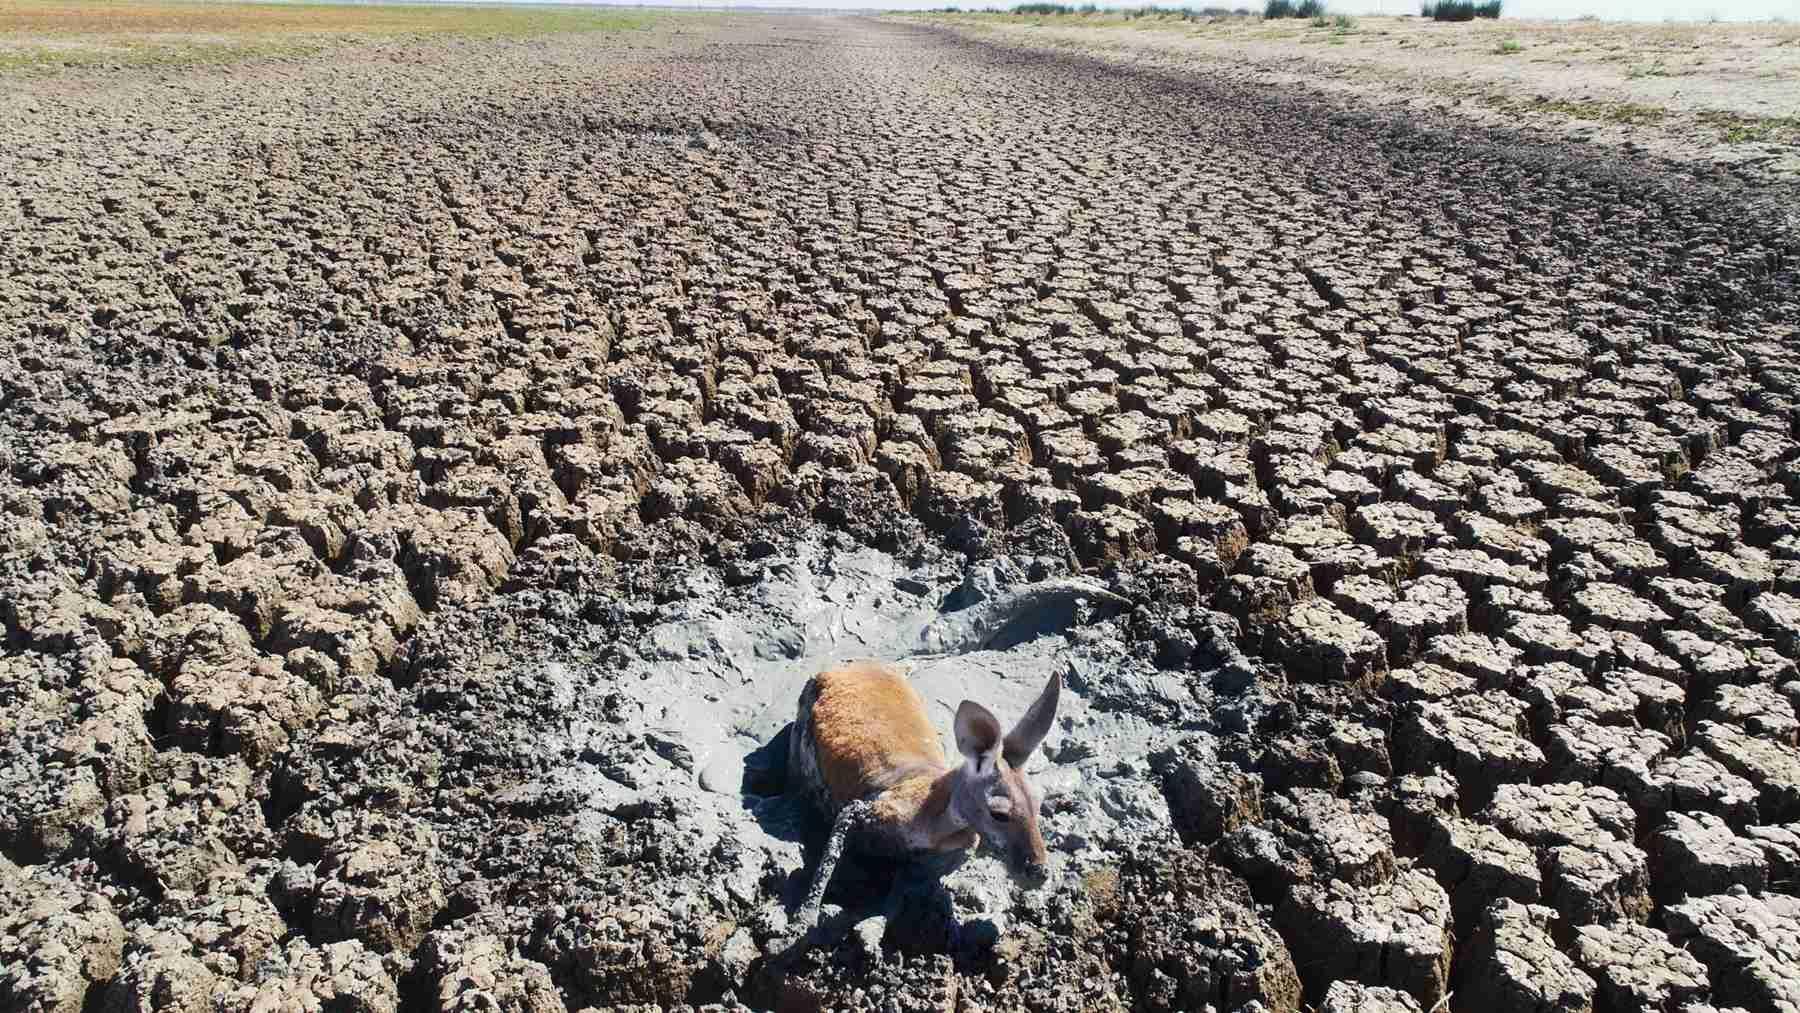 Animals struggle to survive as Australia faces severe environmental crisis